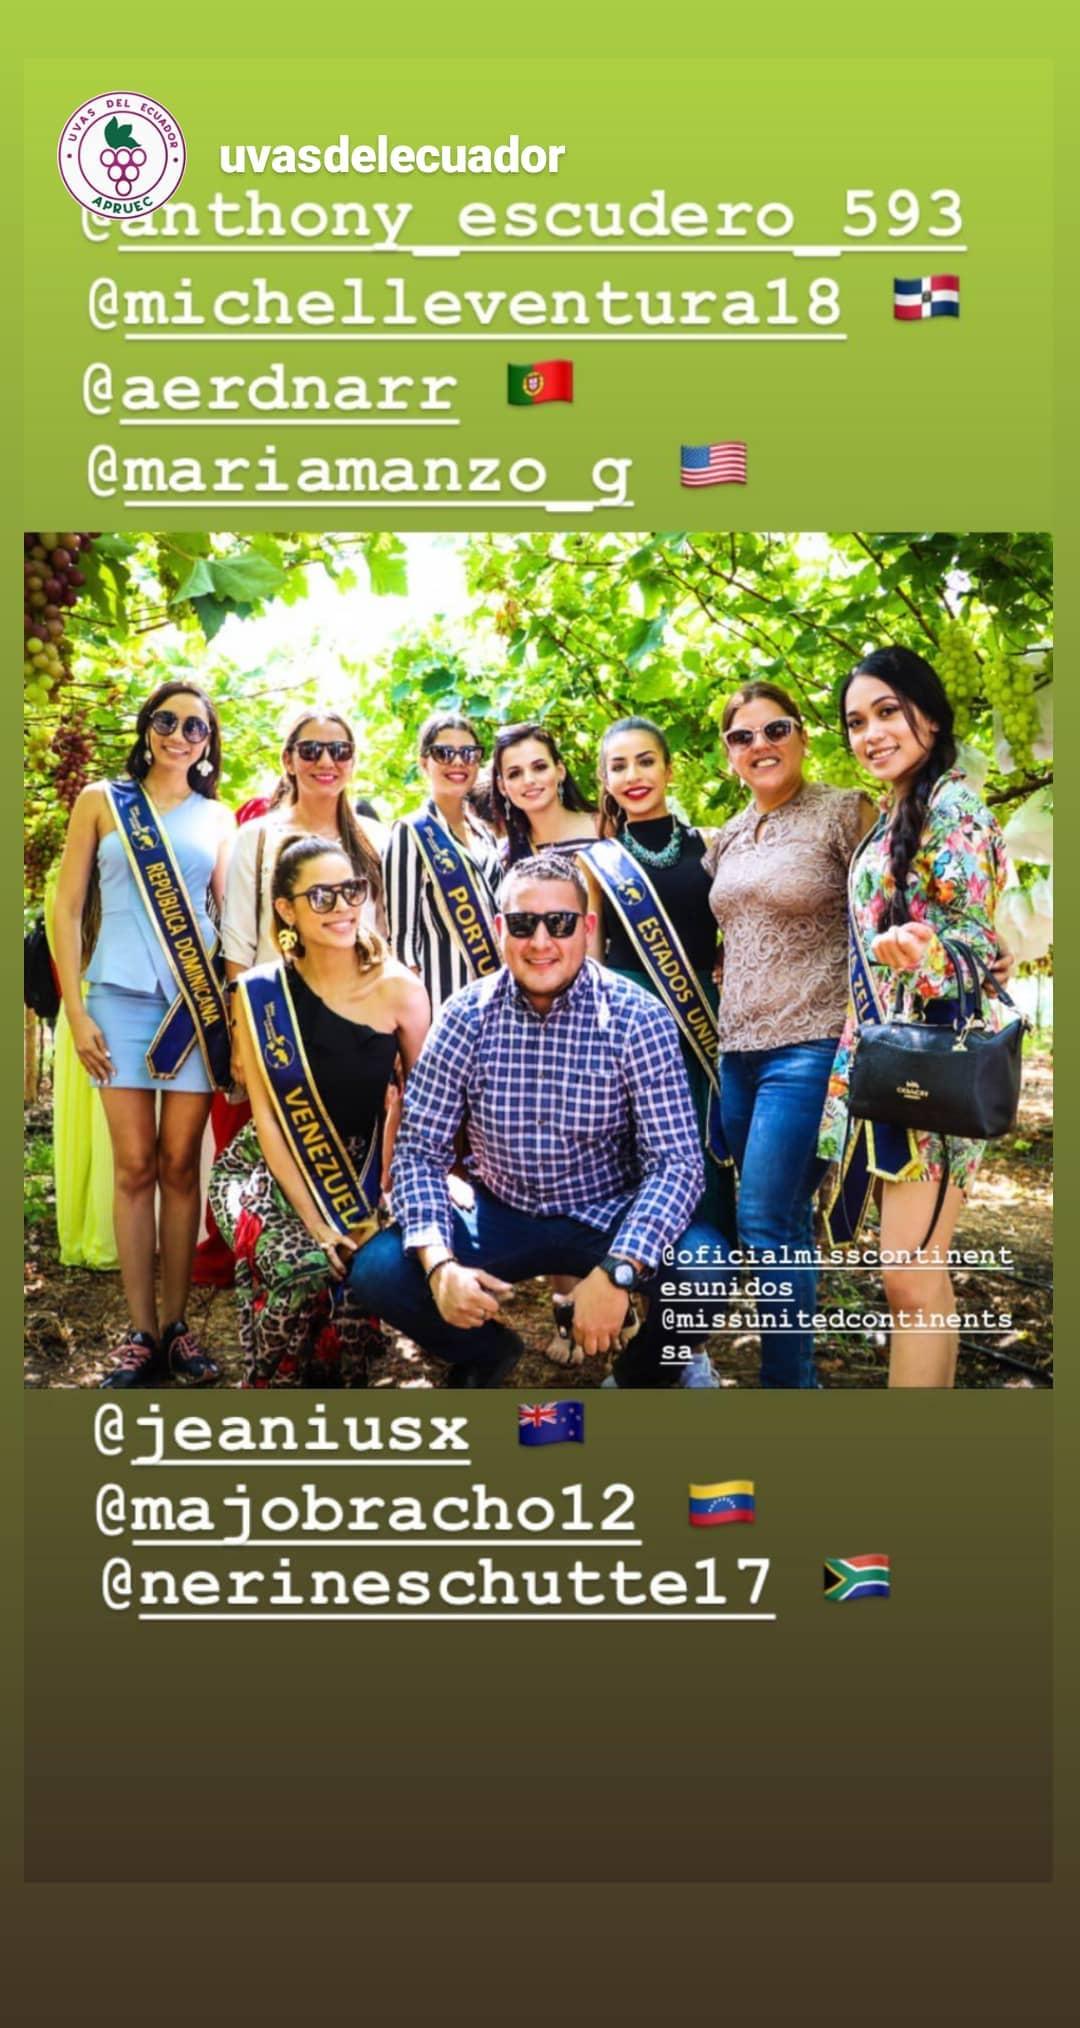 maria elena manzo, miss united continents us 2019. - Página 3 70909910